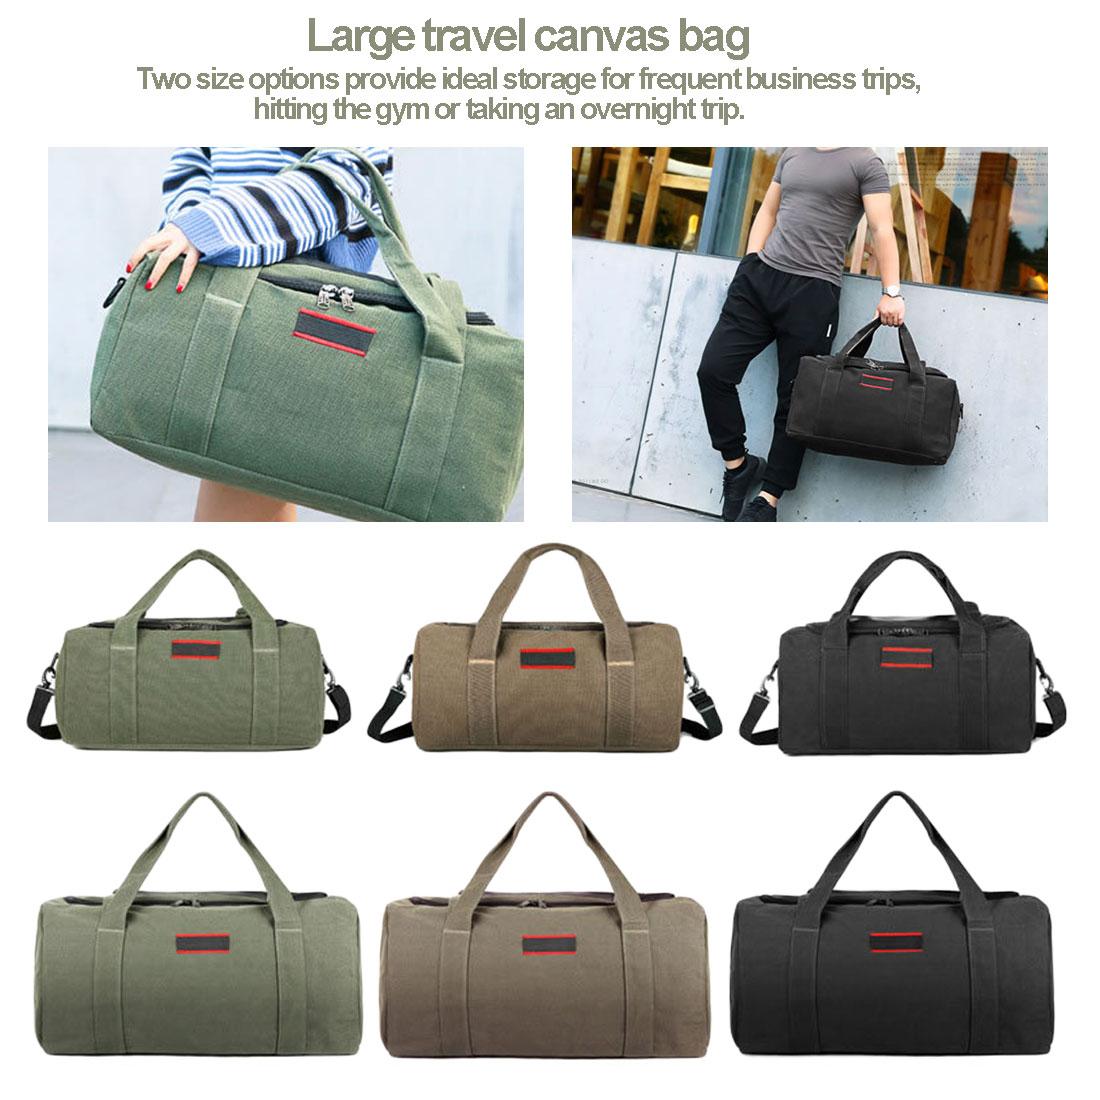 Unisex Large Capacity Travelling Canvas Handbag Single-Shoulder Cross-Body Bag Luggage Bag